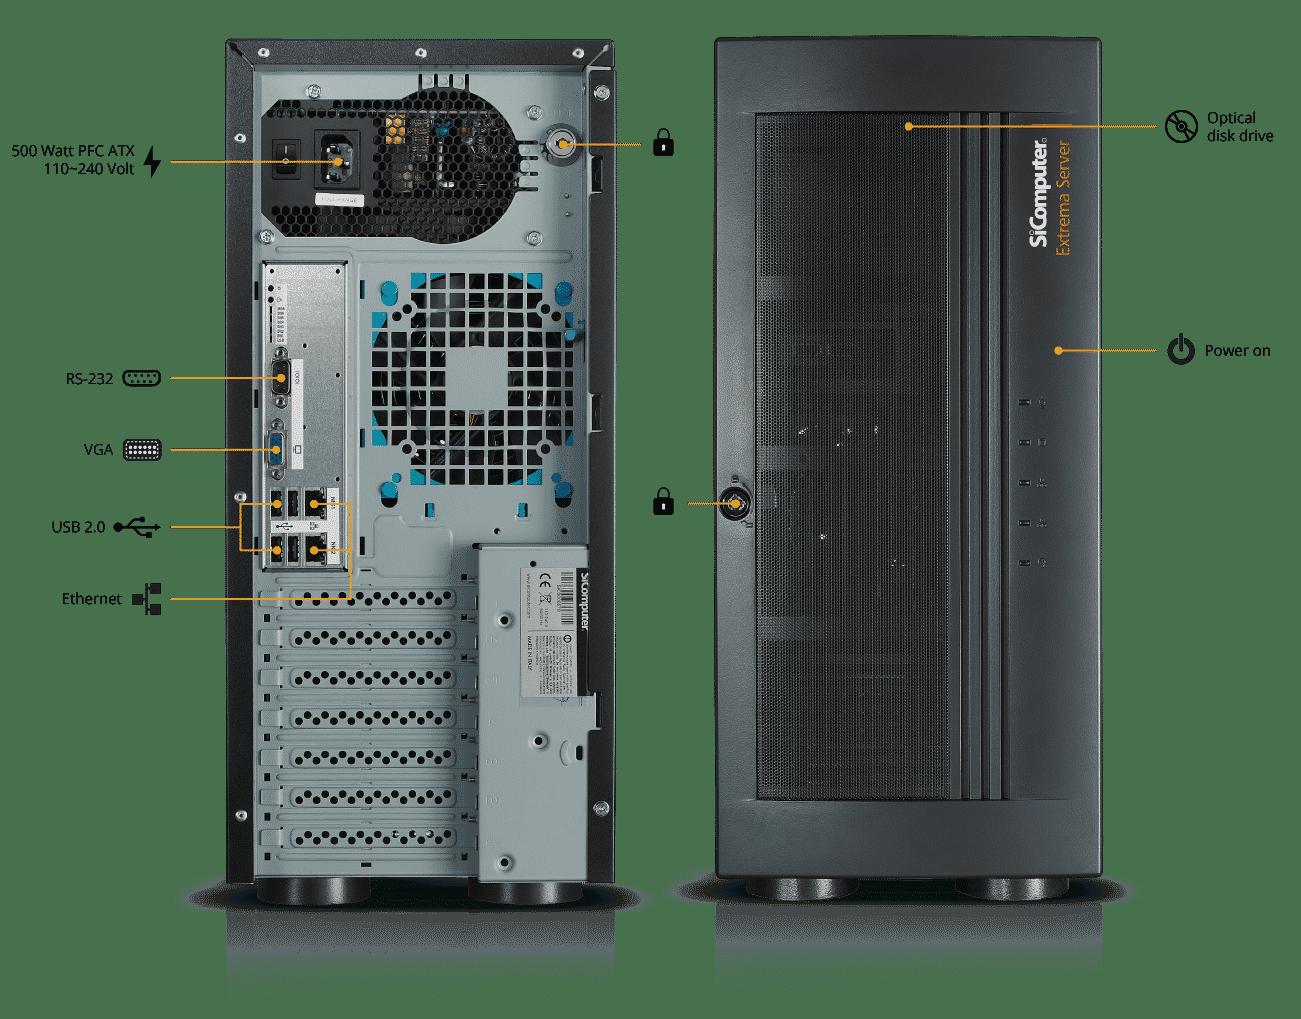 Extrema-Server-S100-200-Componenti-INGLESE